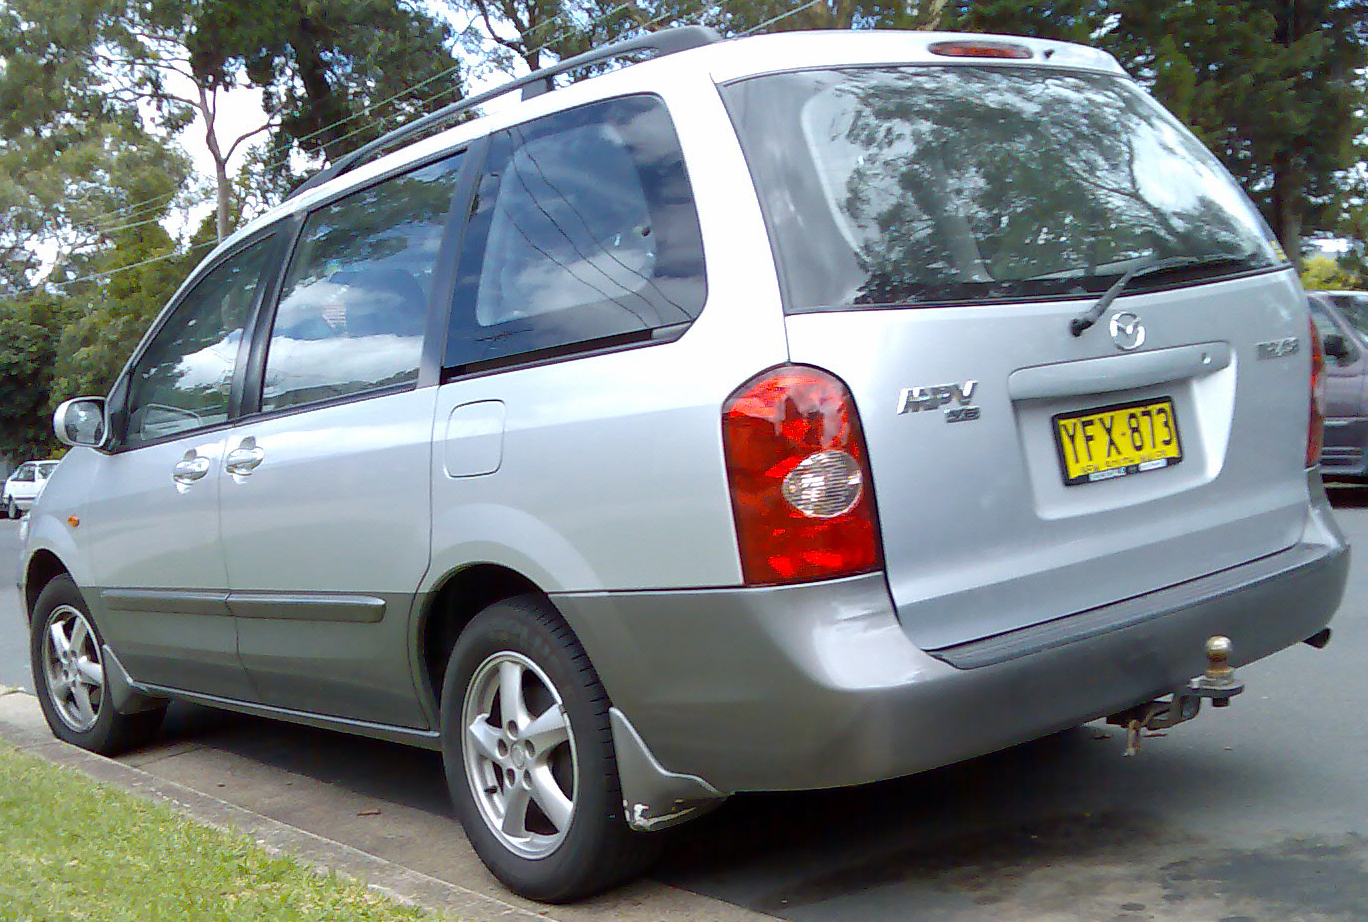 File:2002-2003 Mazda MPV (LW Series 2) van 01.jpg